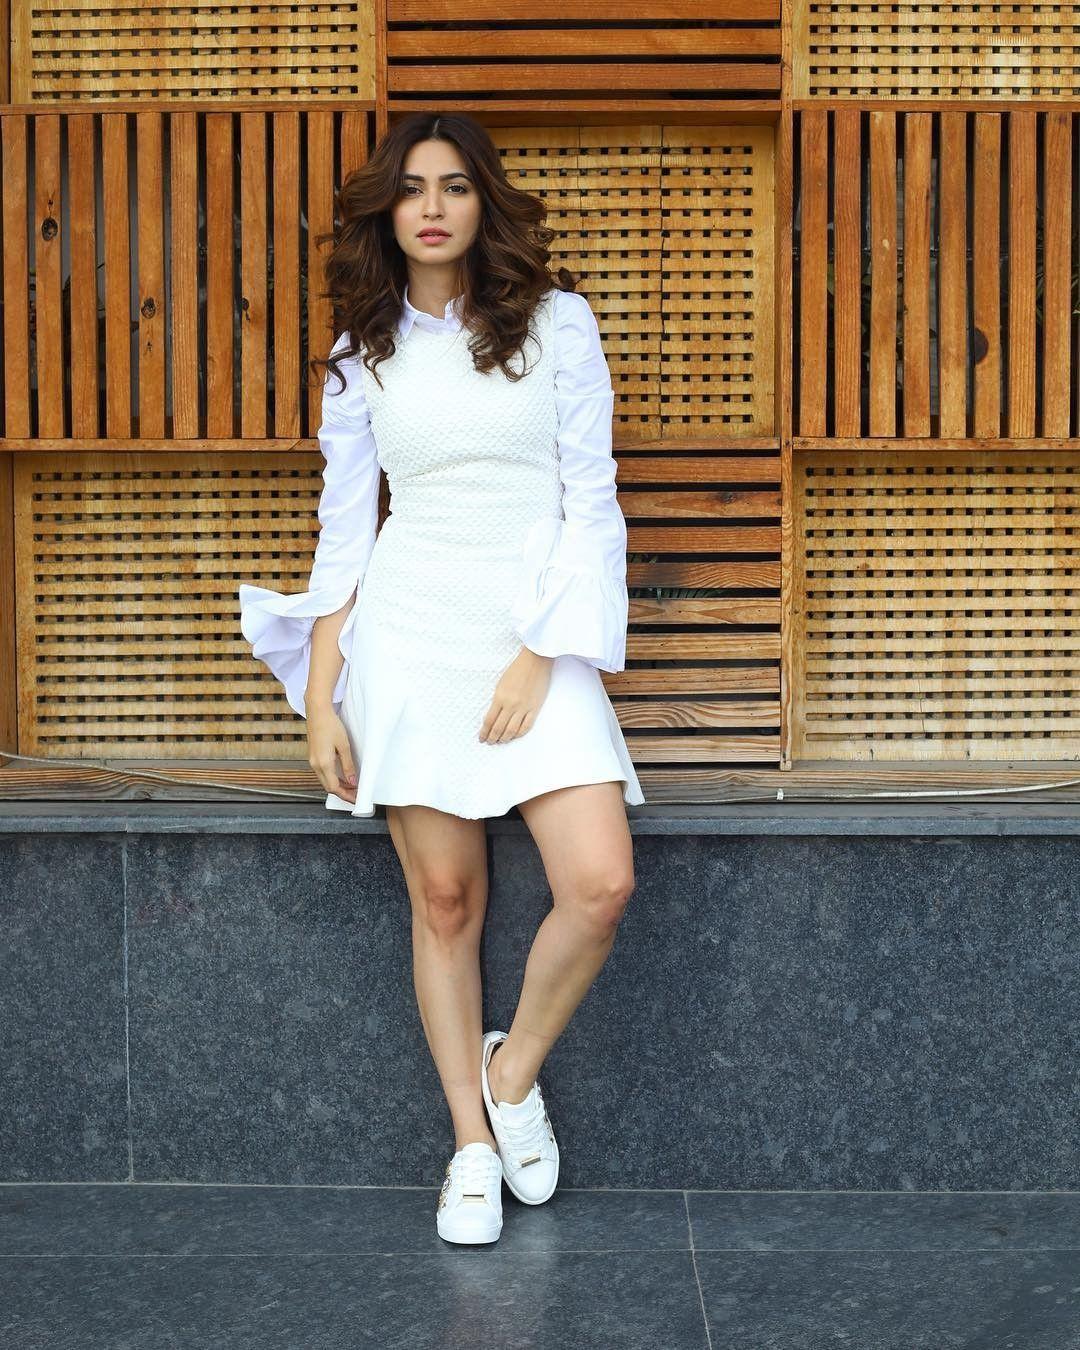 Pin By Ankita Upadhyay On Kriti Kharbanda Bollywood Actress Hot Photos Clothes For Women Bollywood Actress Hot